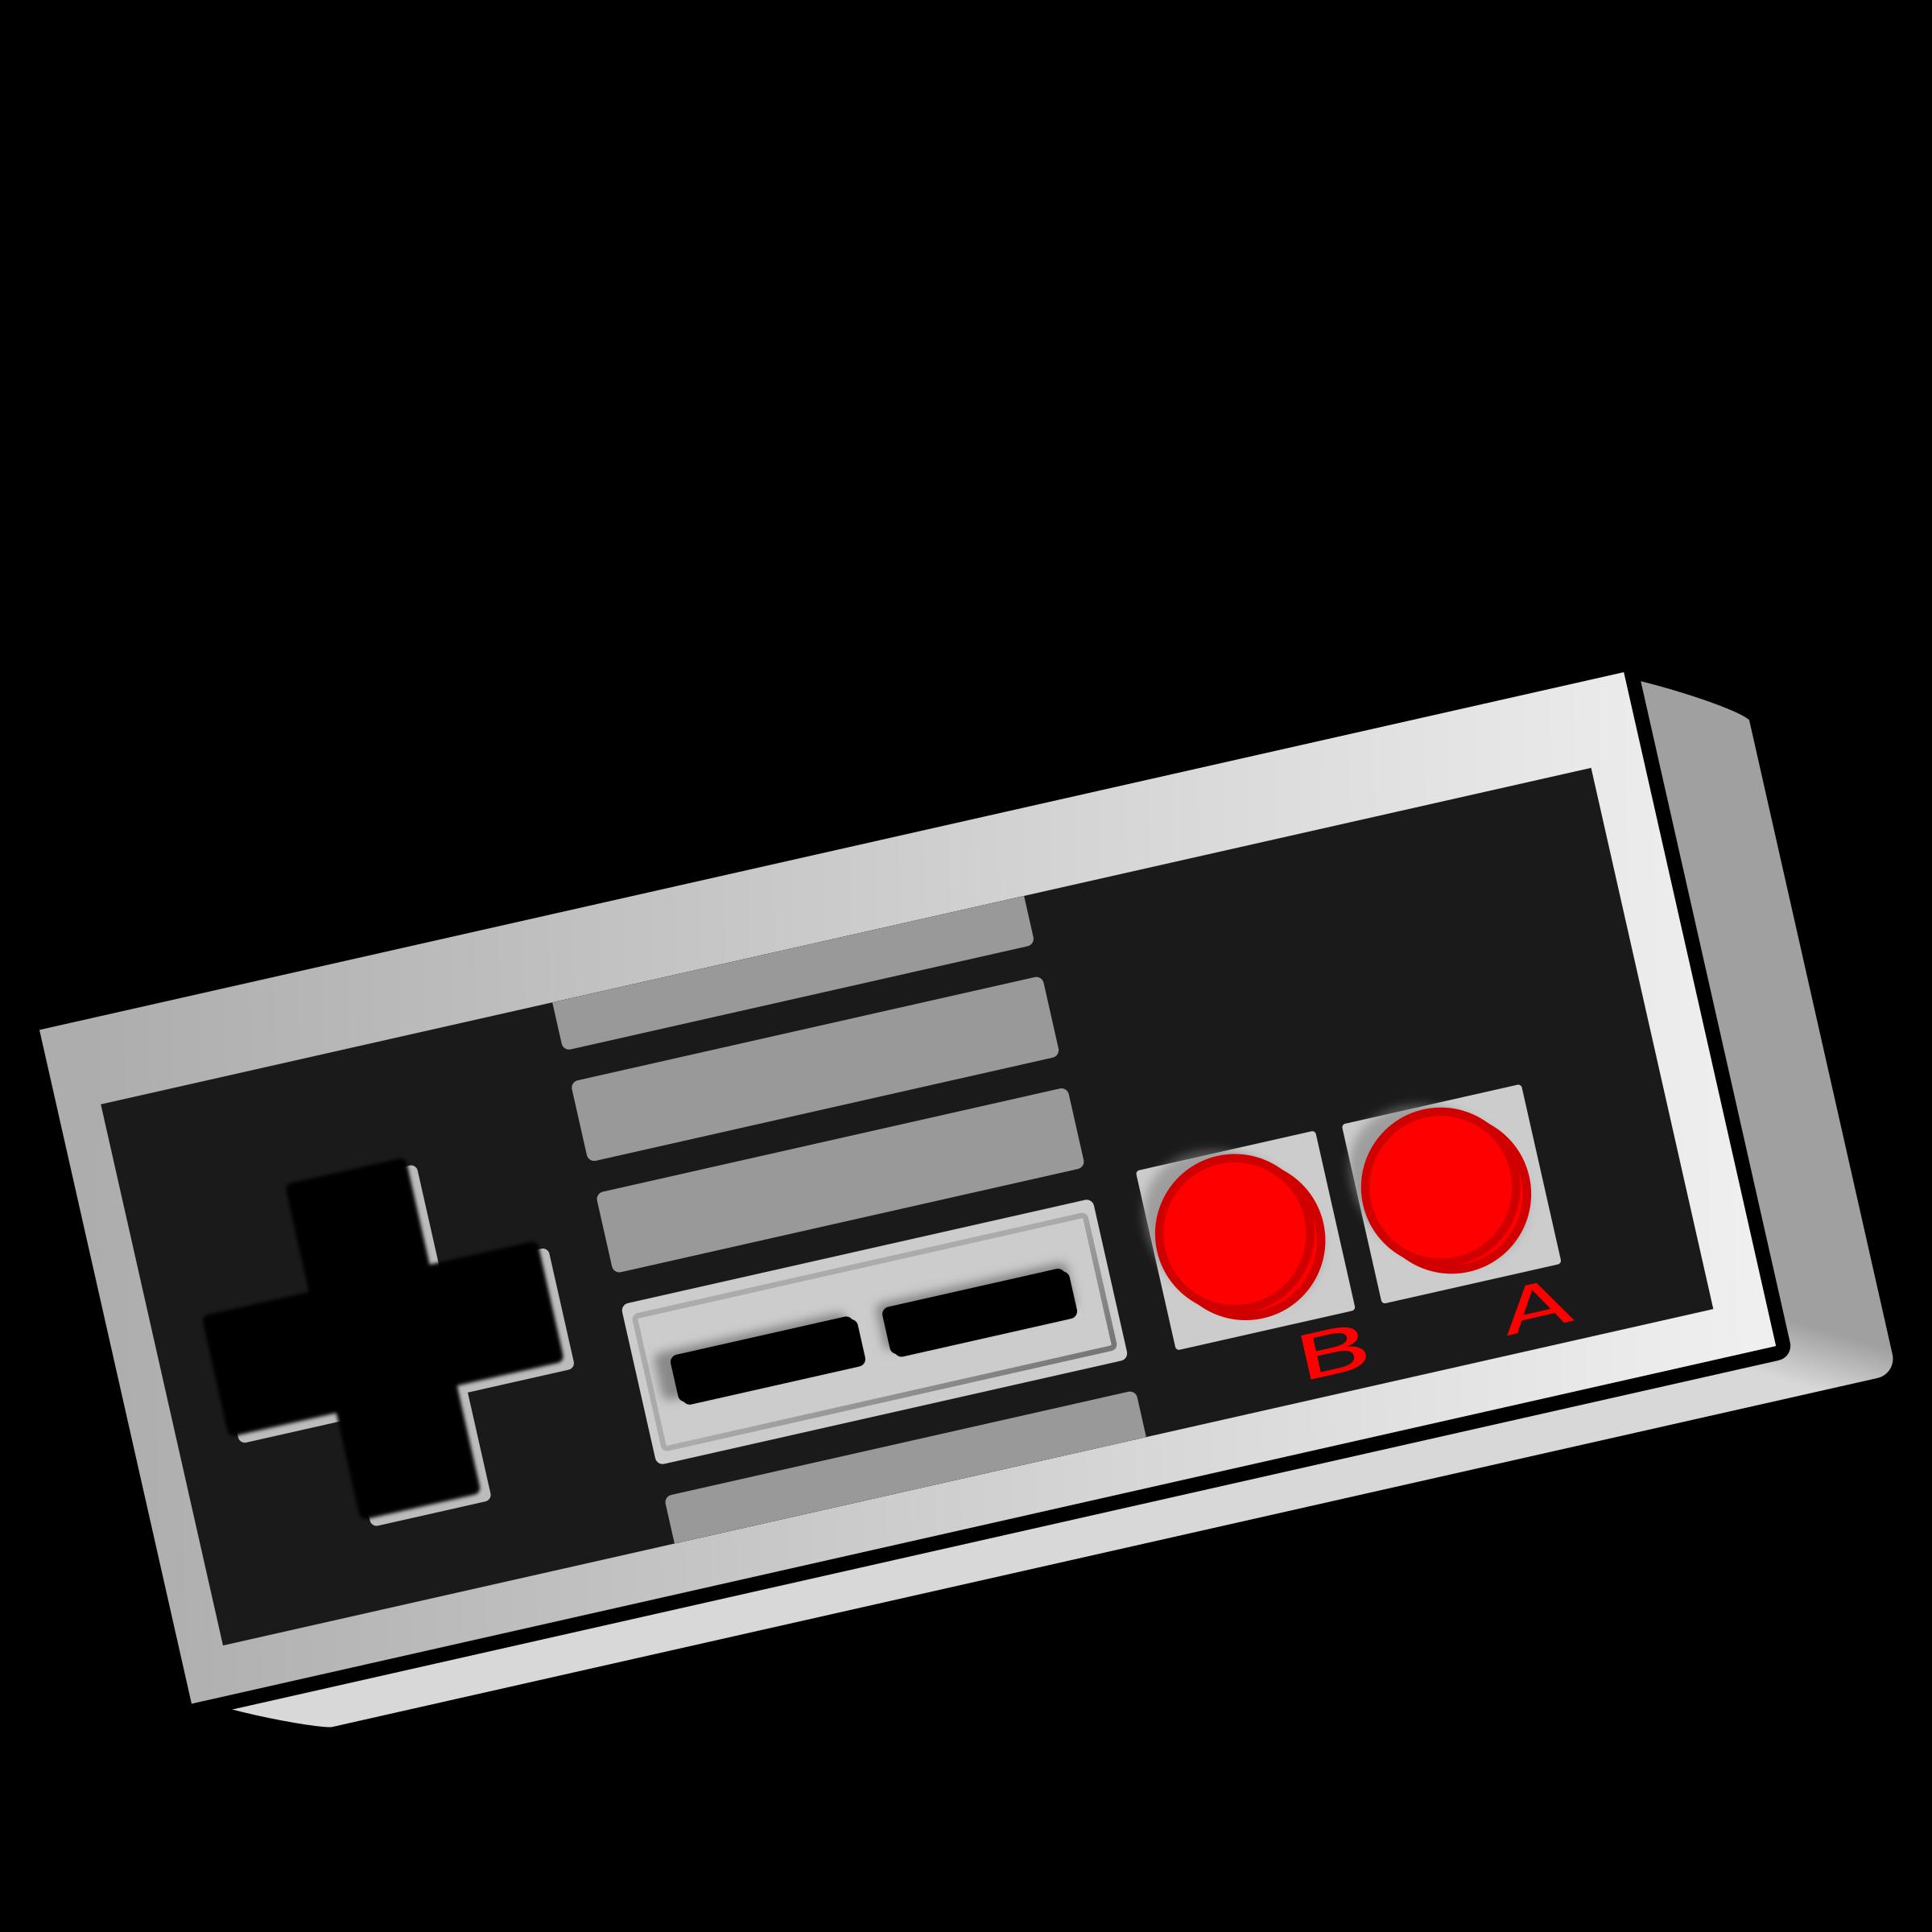 8 bit video game clip art-8 bit video game clip art-10